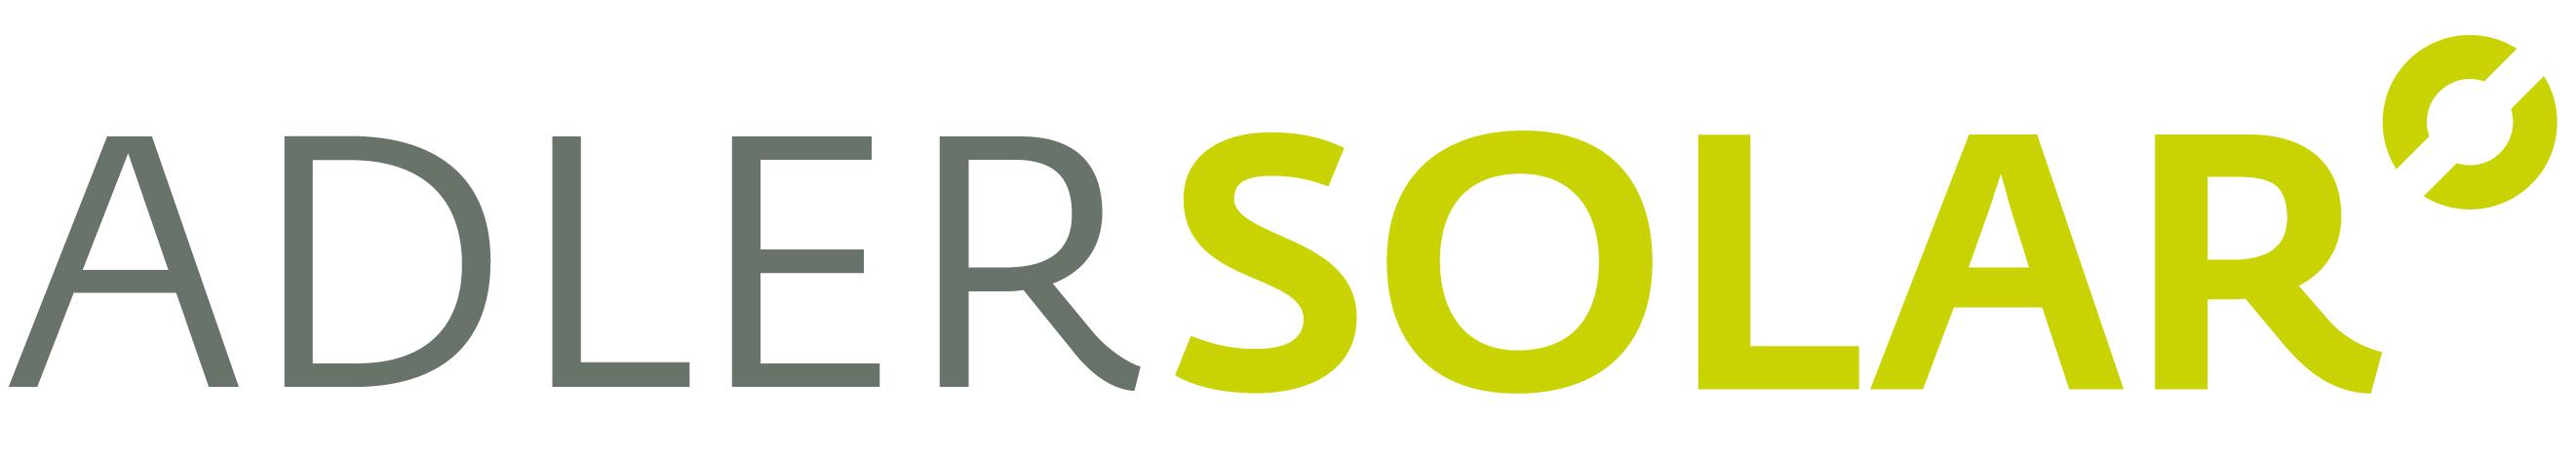 Adler Solar Services GmbH